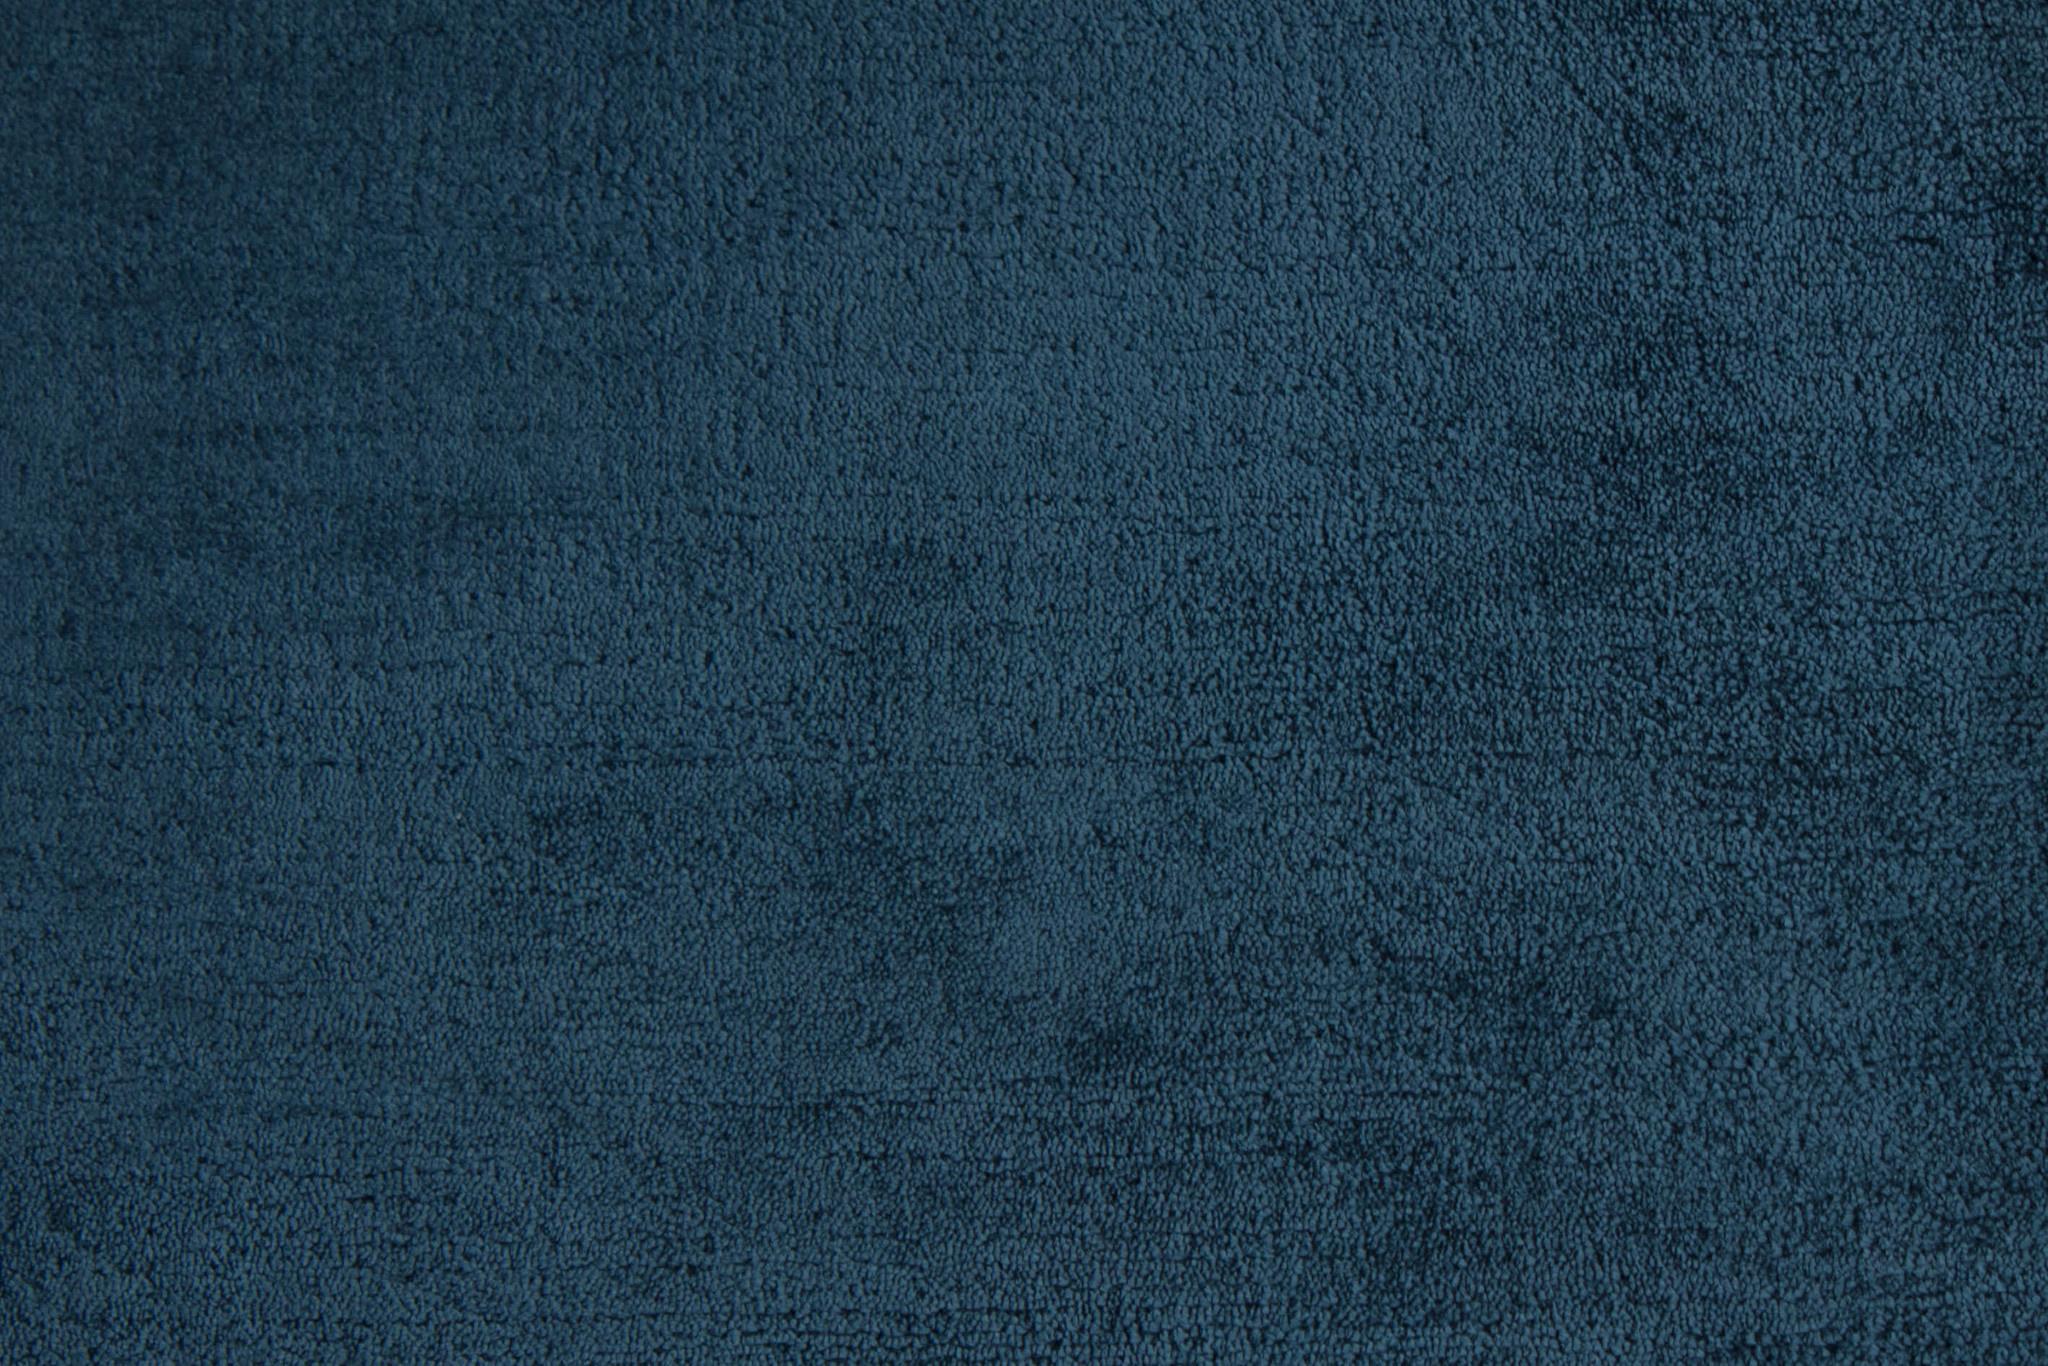 PARMA Carpet Dark Denim 300x400-1